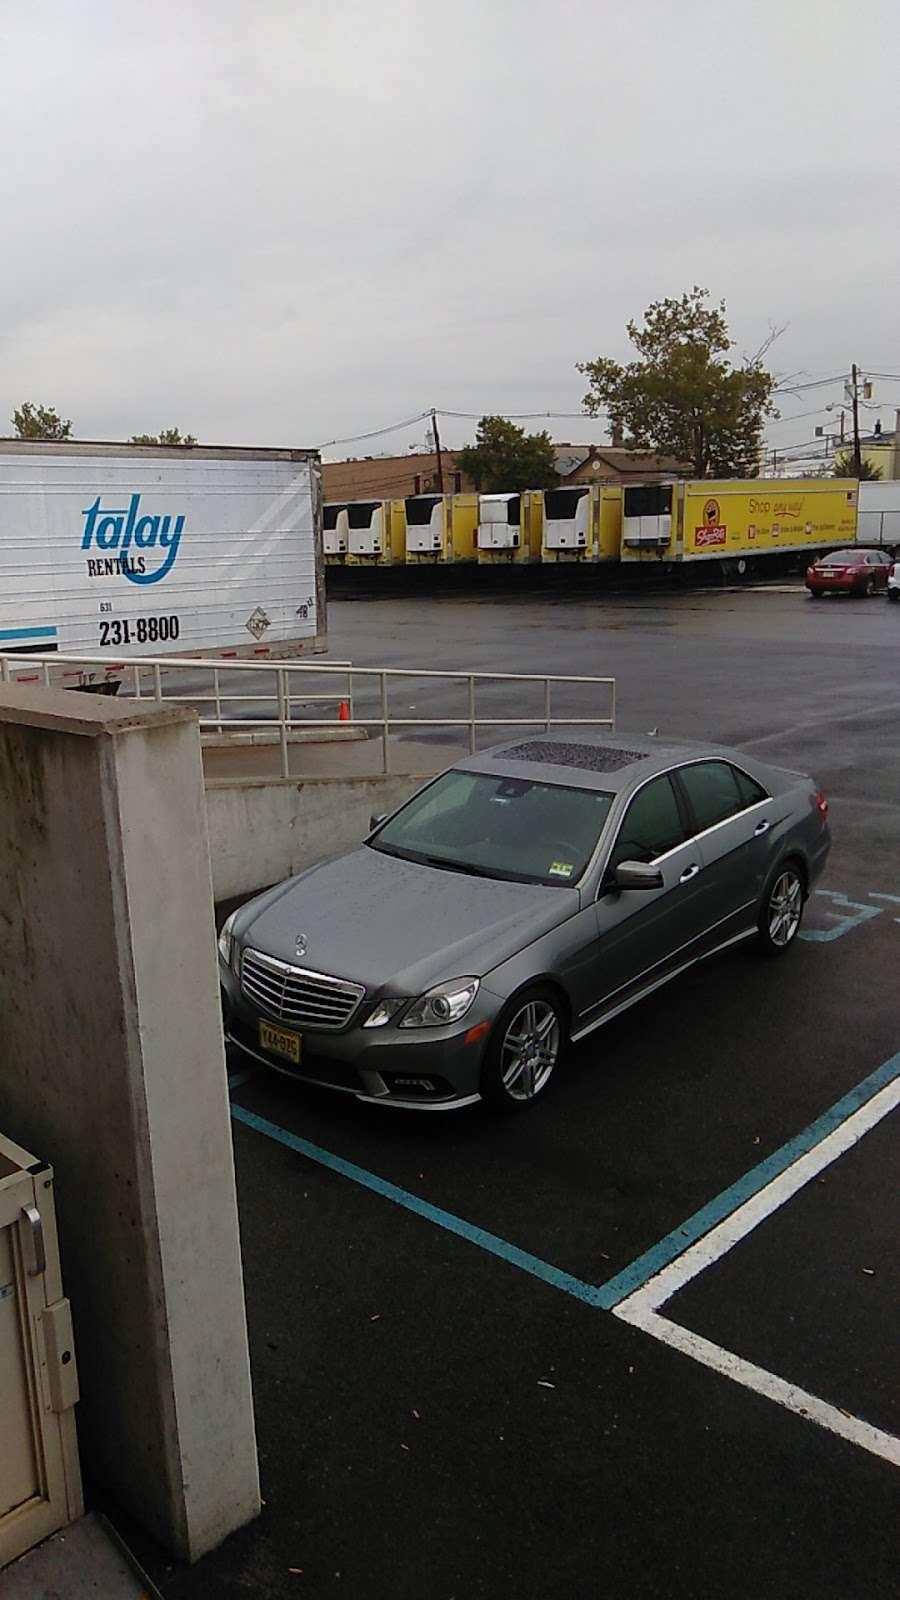 Wakefern Food Corporation - store    Photo 10 of 10   Address: 51 Euclid Ave, Newark, NJ 07105, USA   Phone: (973) 589-3960